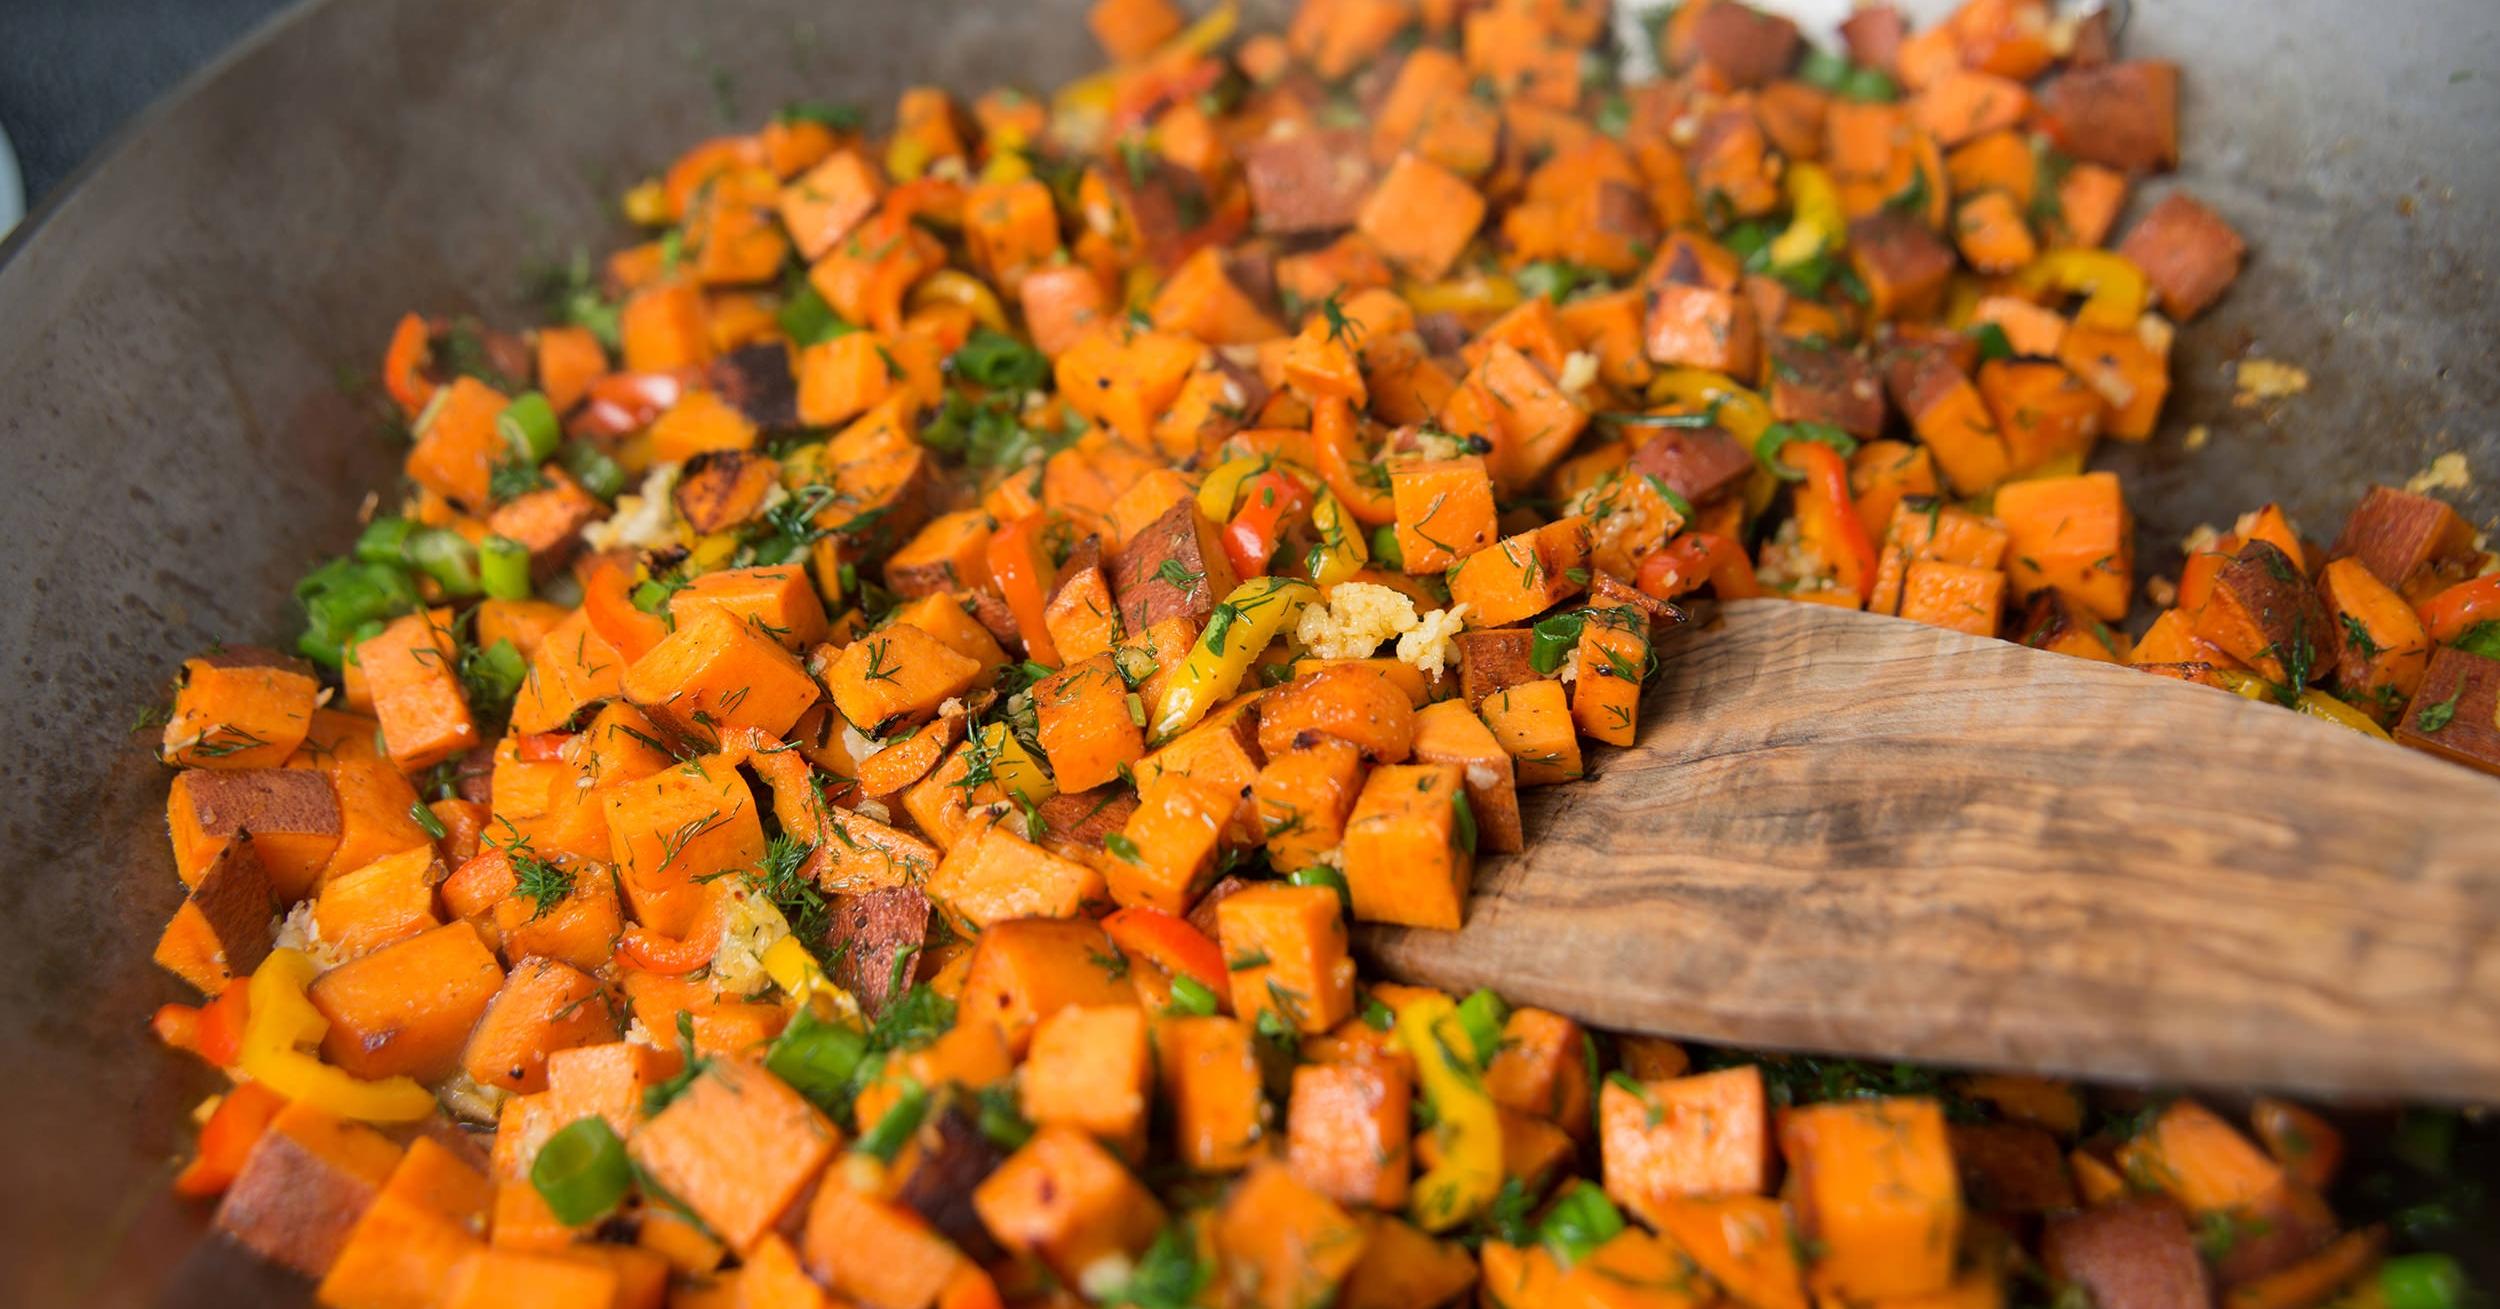 Plant-based breakfast skillet, healthy vegan brunch food.